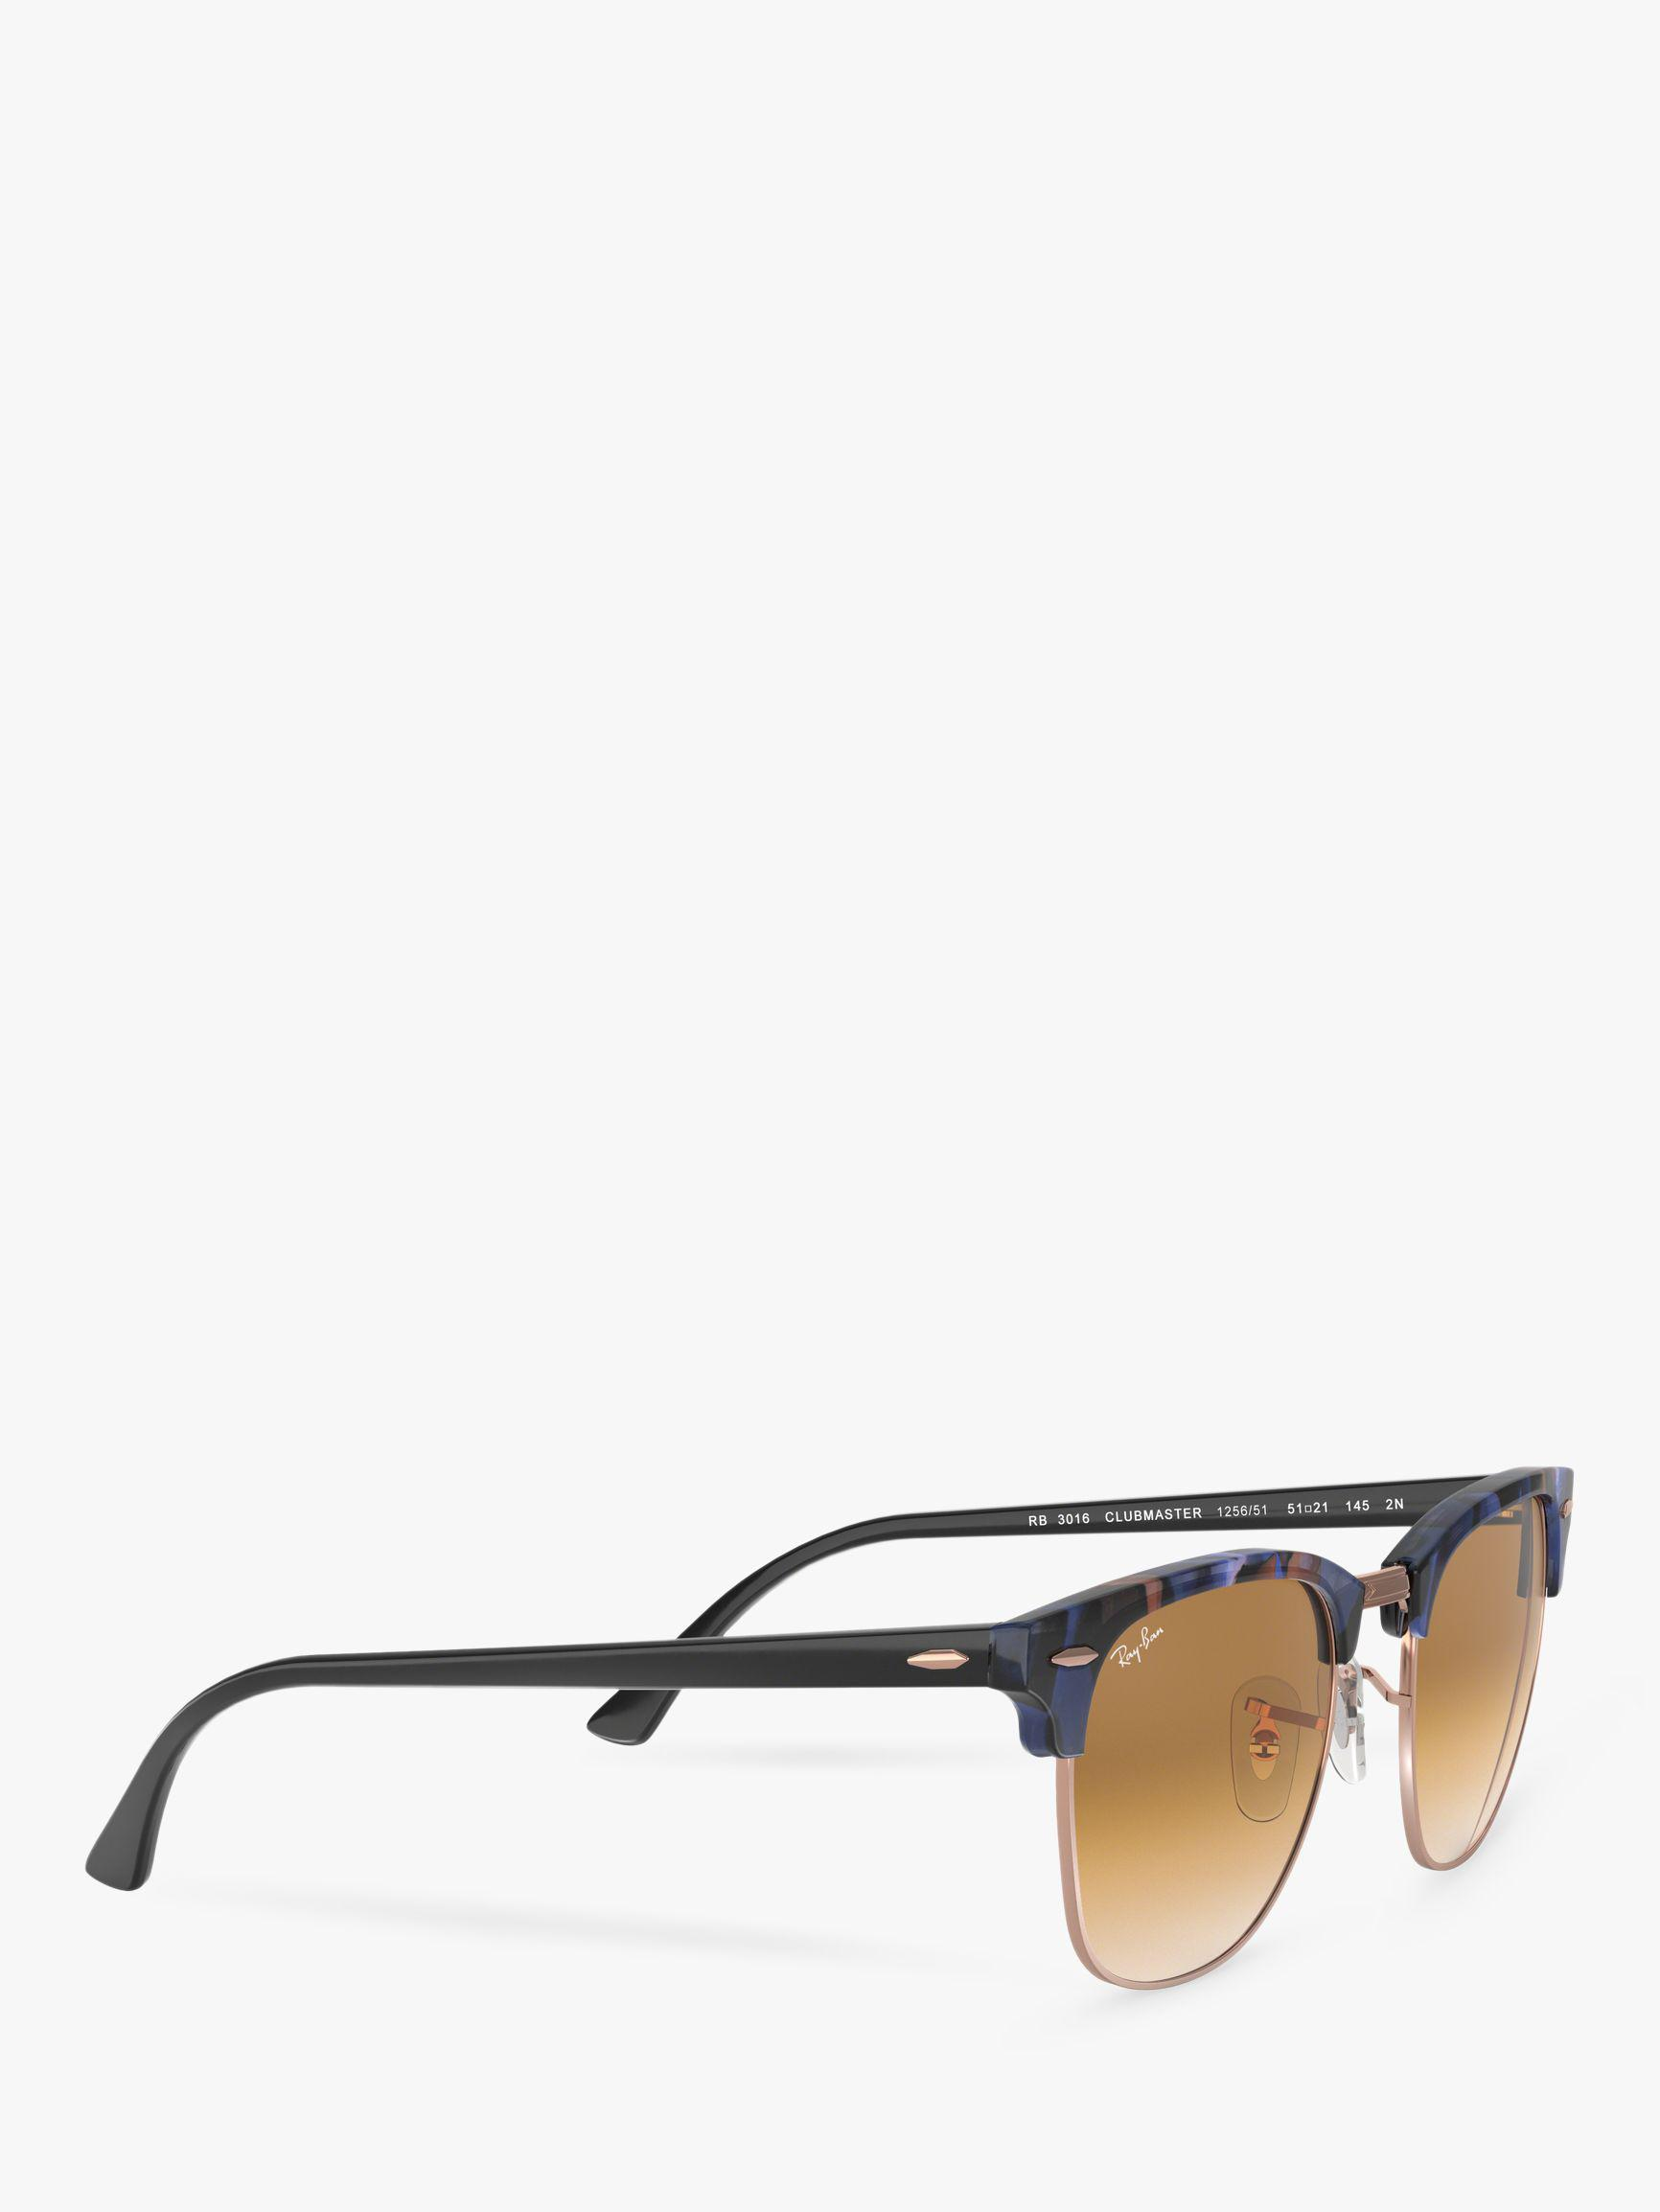 12525e3e22 Ray-Ban Rb3016 Men s Classic Clubmaster Sunglasses in Brown for Men ...